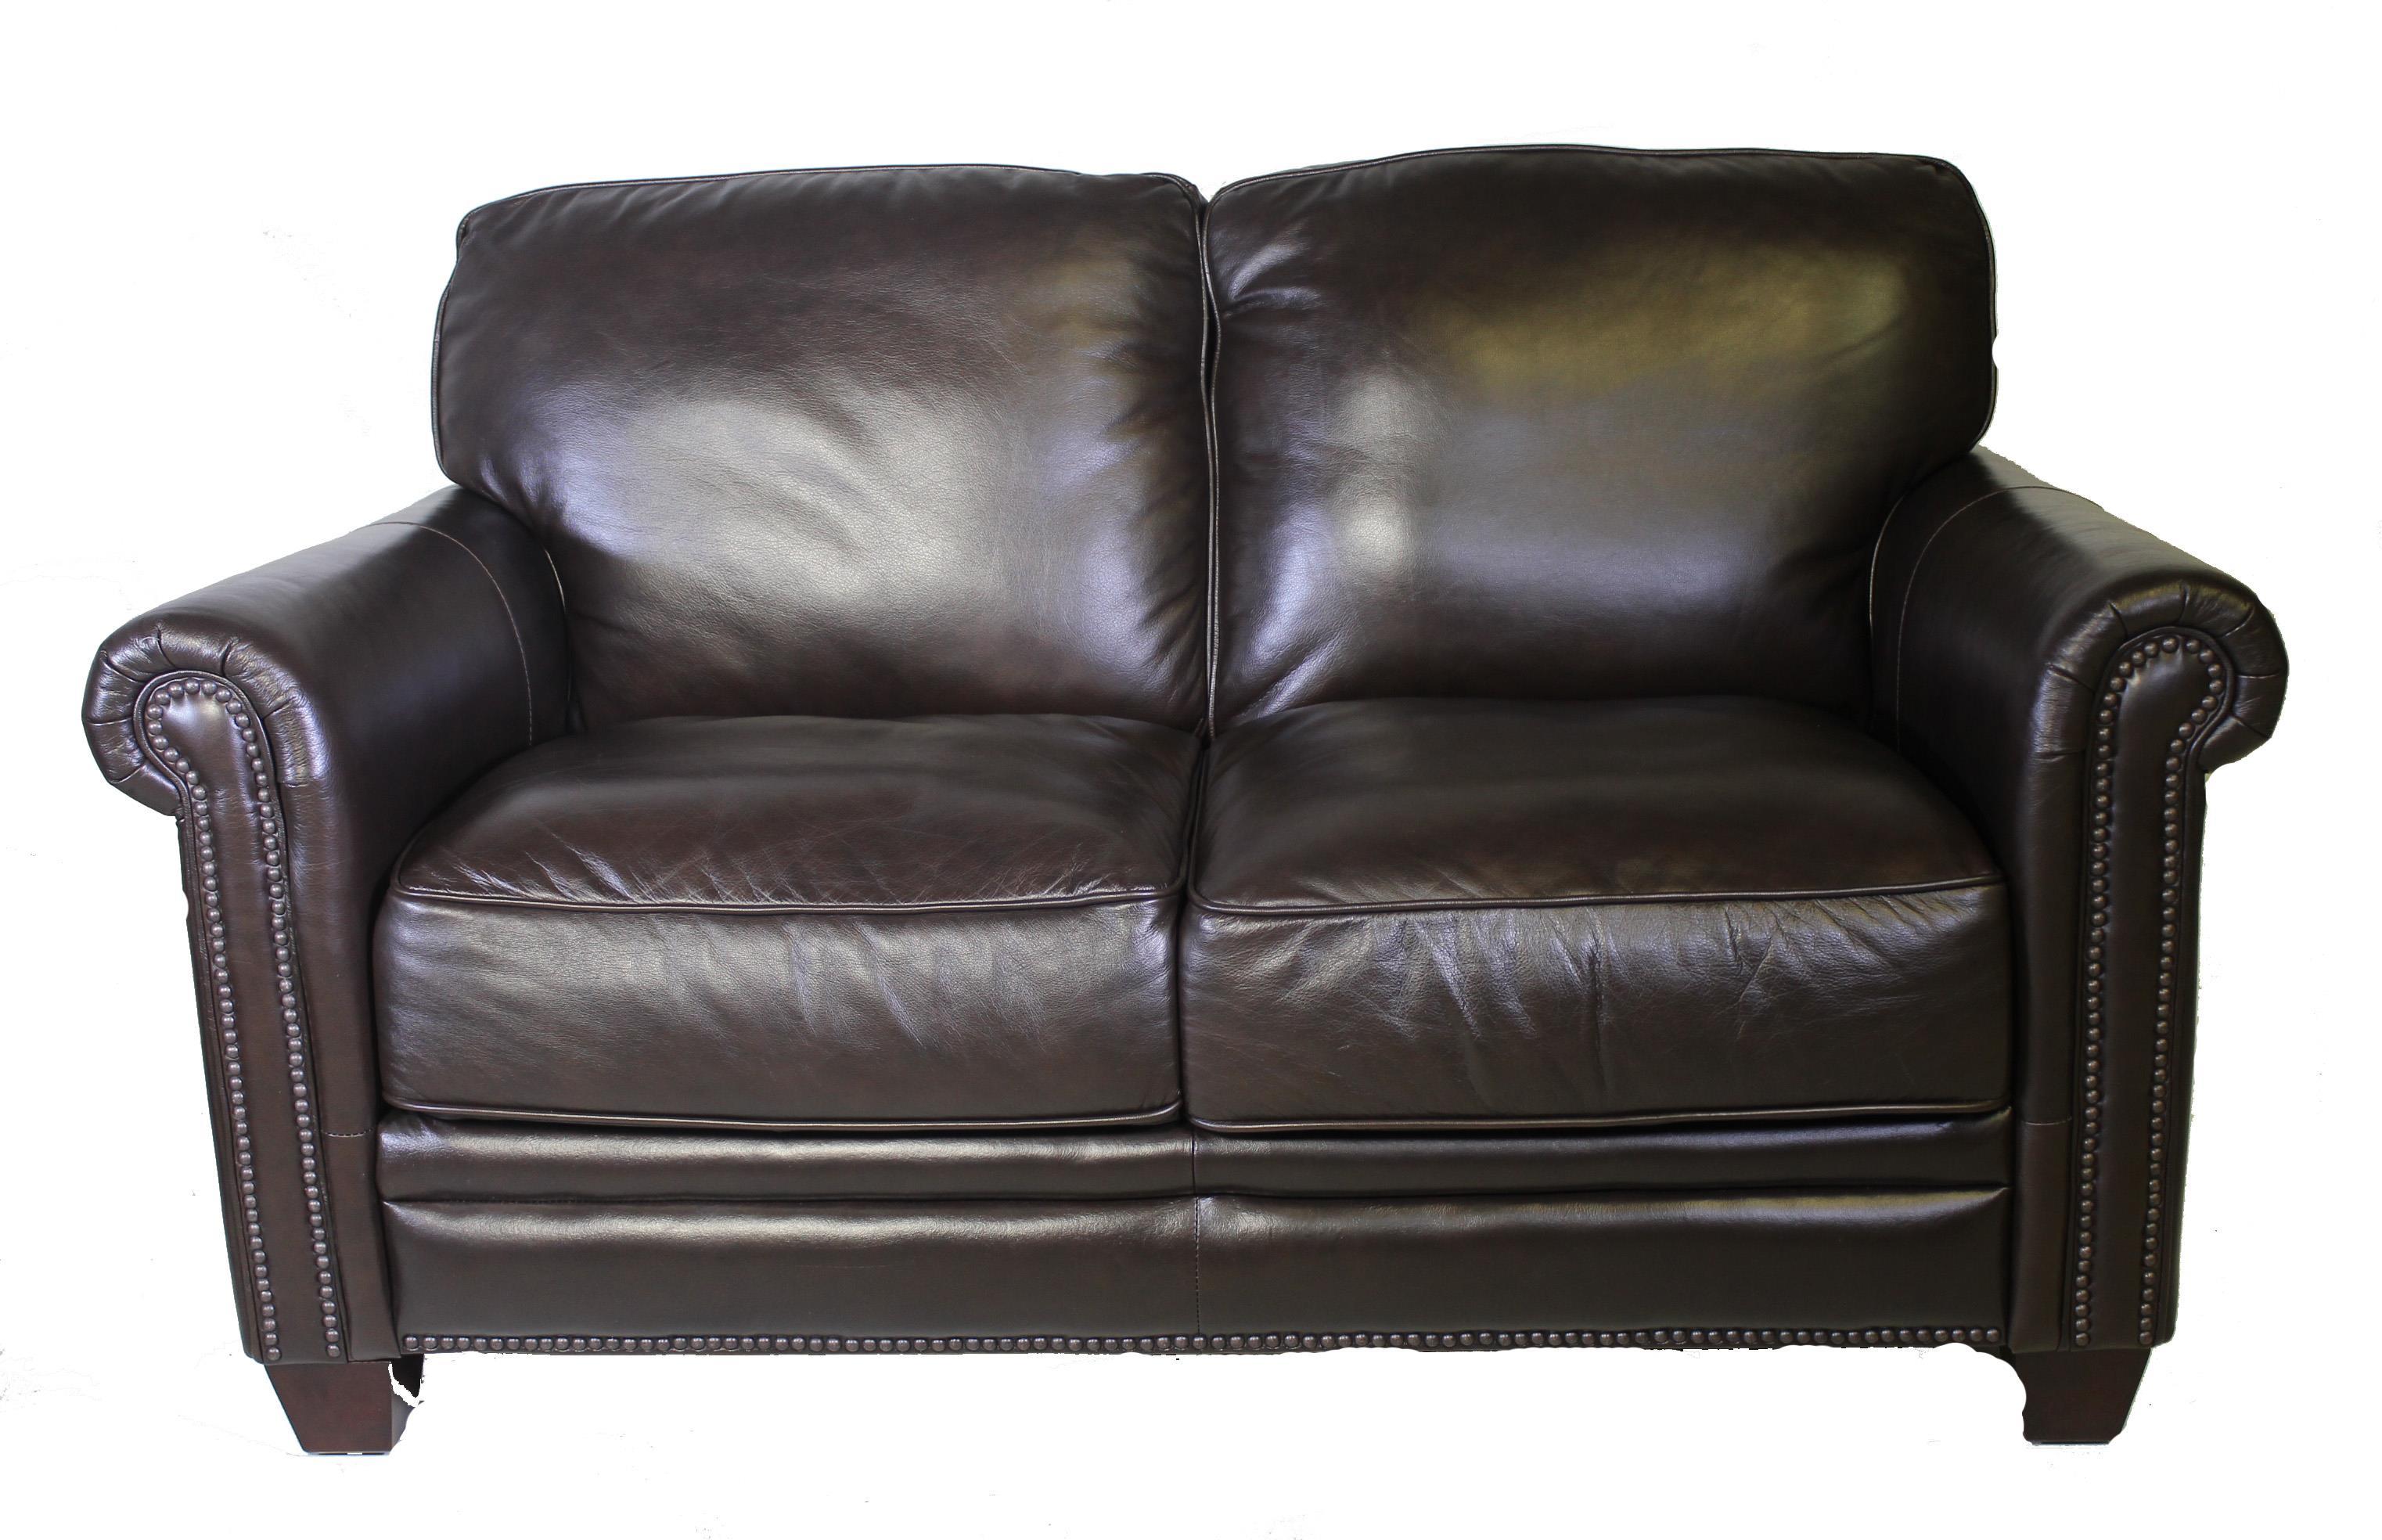 Futura Leather 7888 Leather Loveseat - Item Number: 7888-20